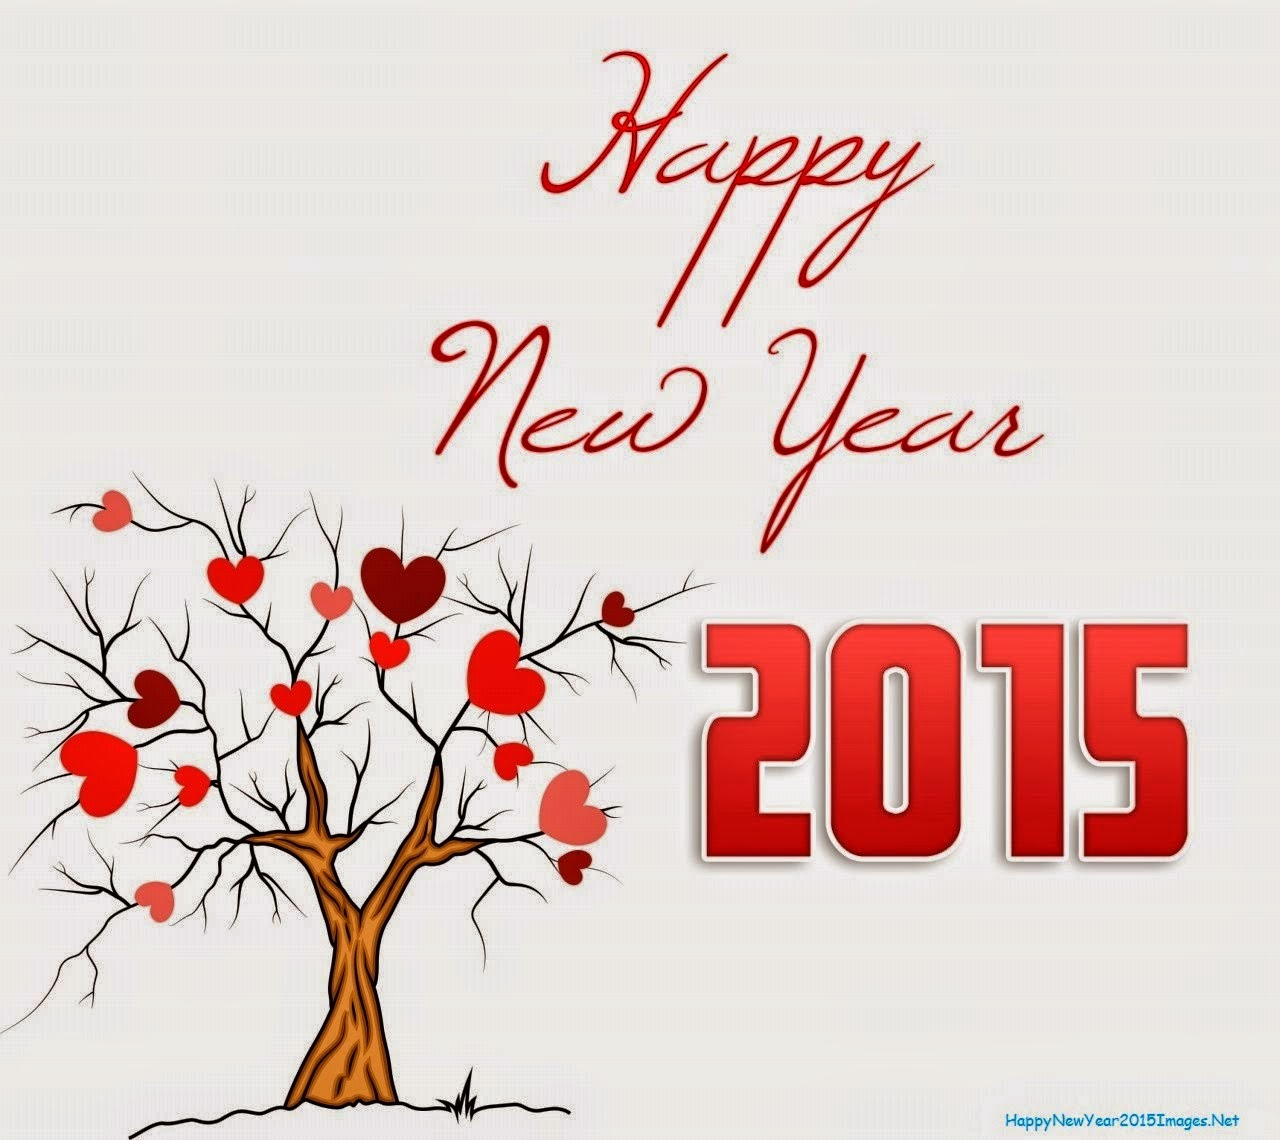 Kata-kata Ucapan Selamat Tahun Baru 2015 Terbaik